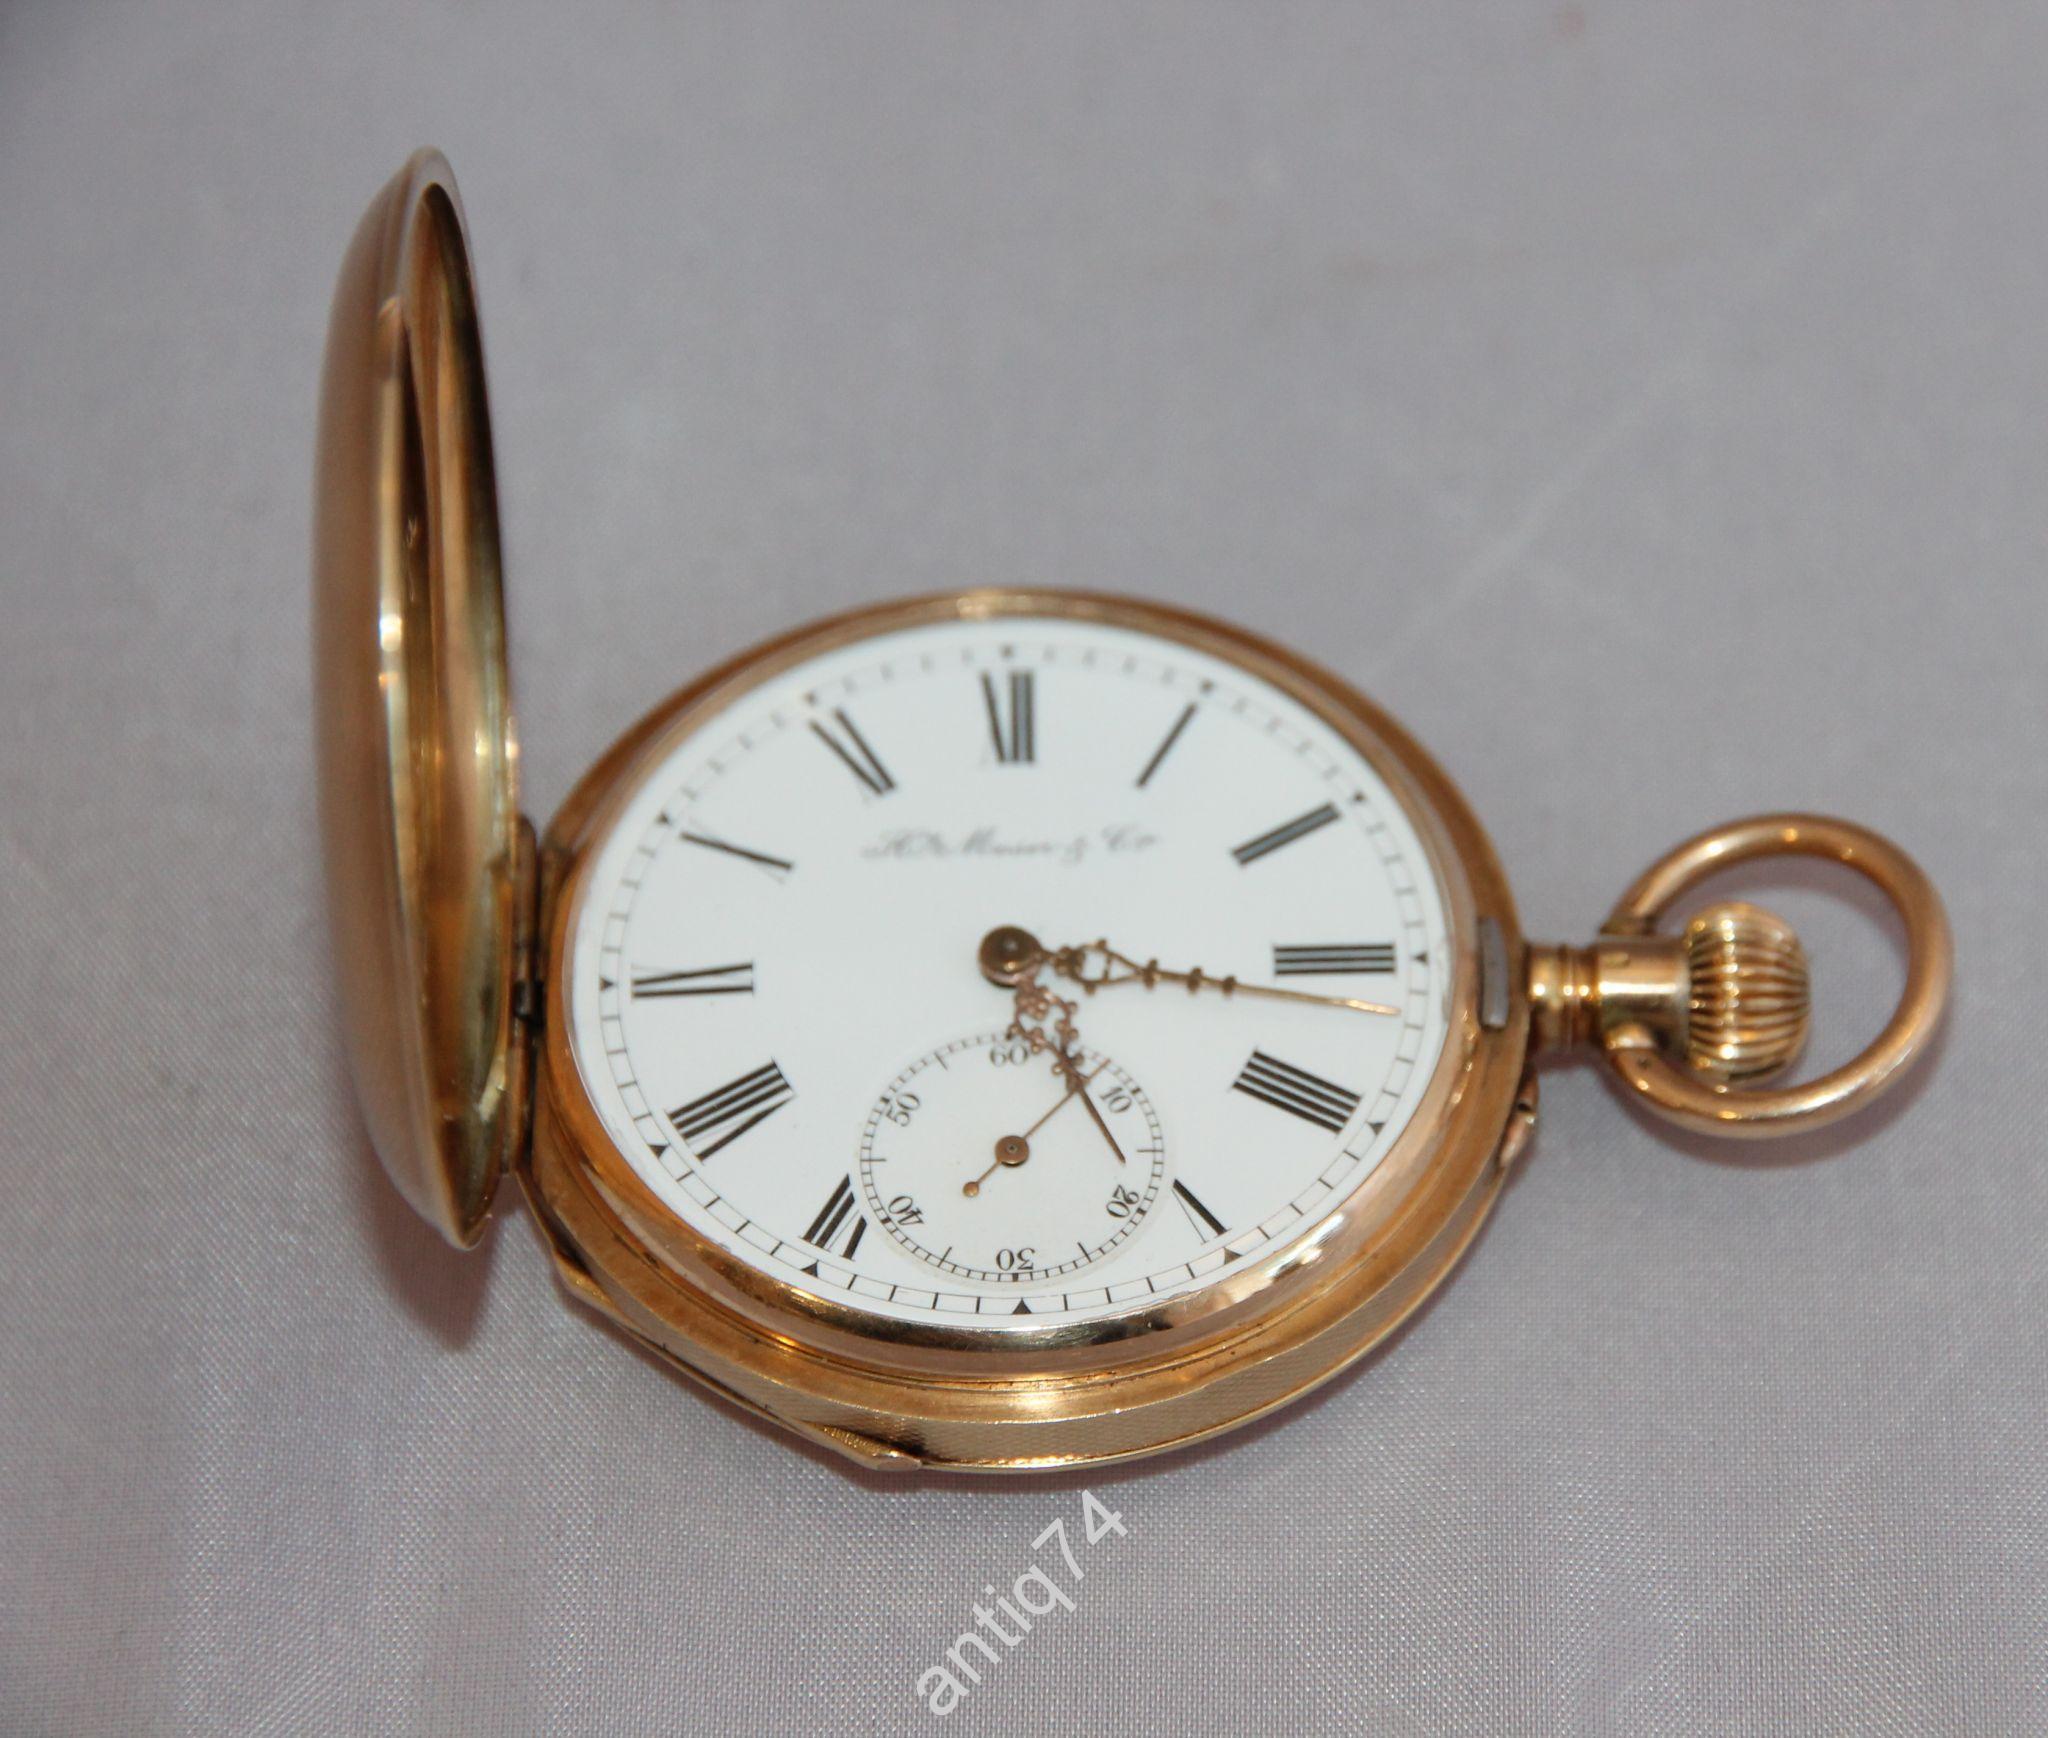 Карманные часы золотые купить mercedes часы наручные